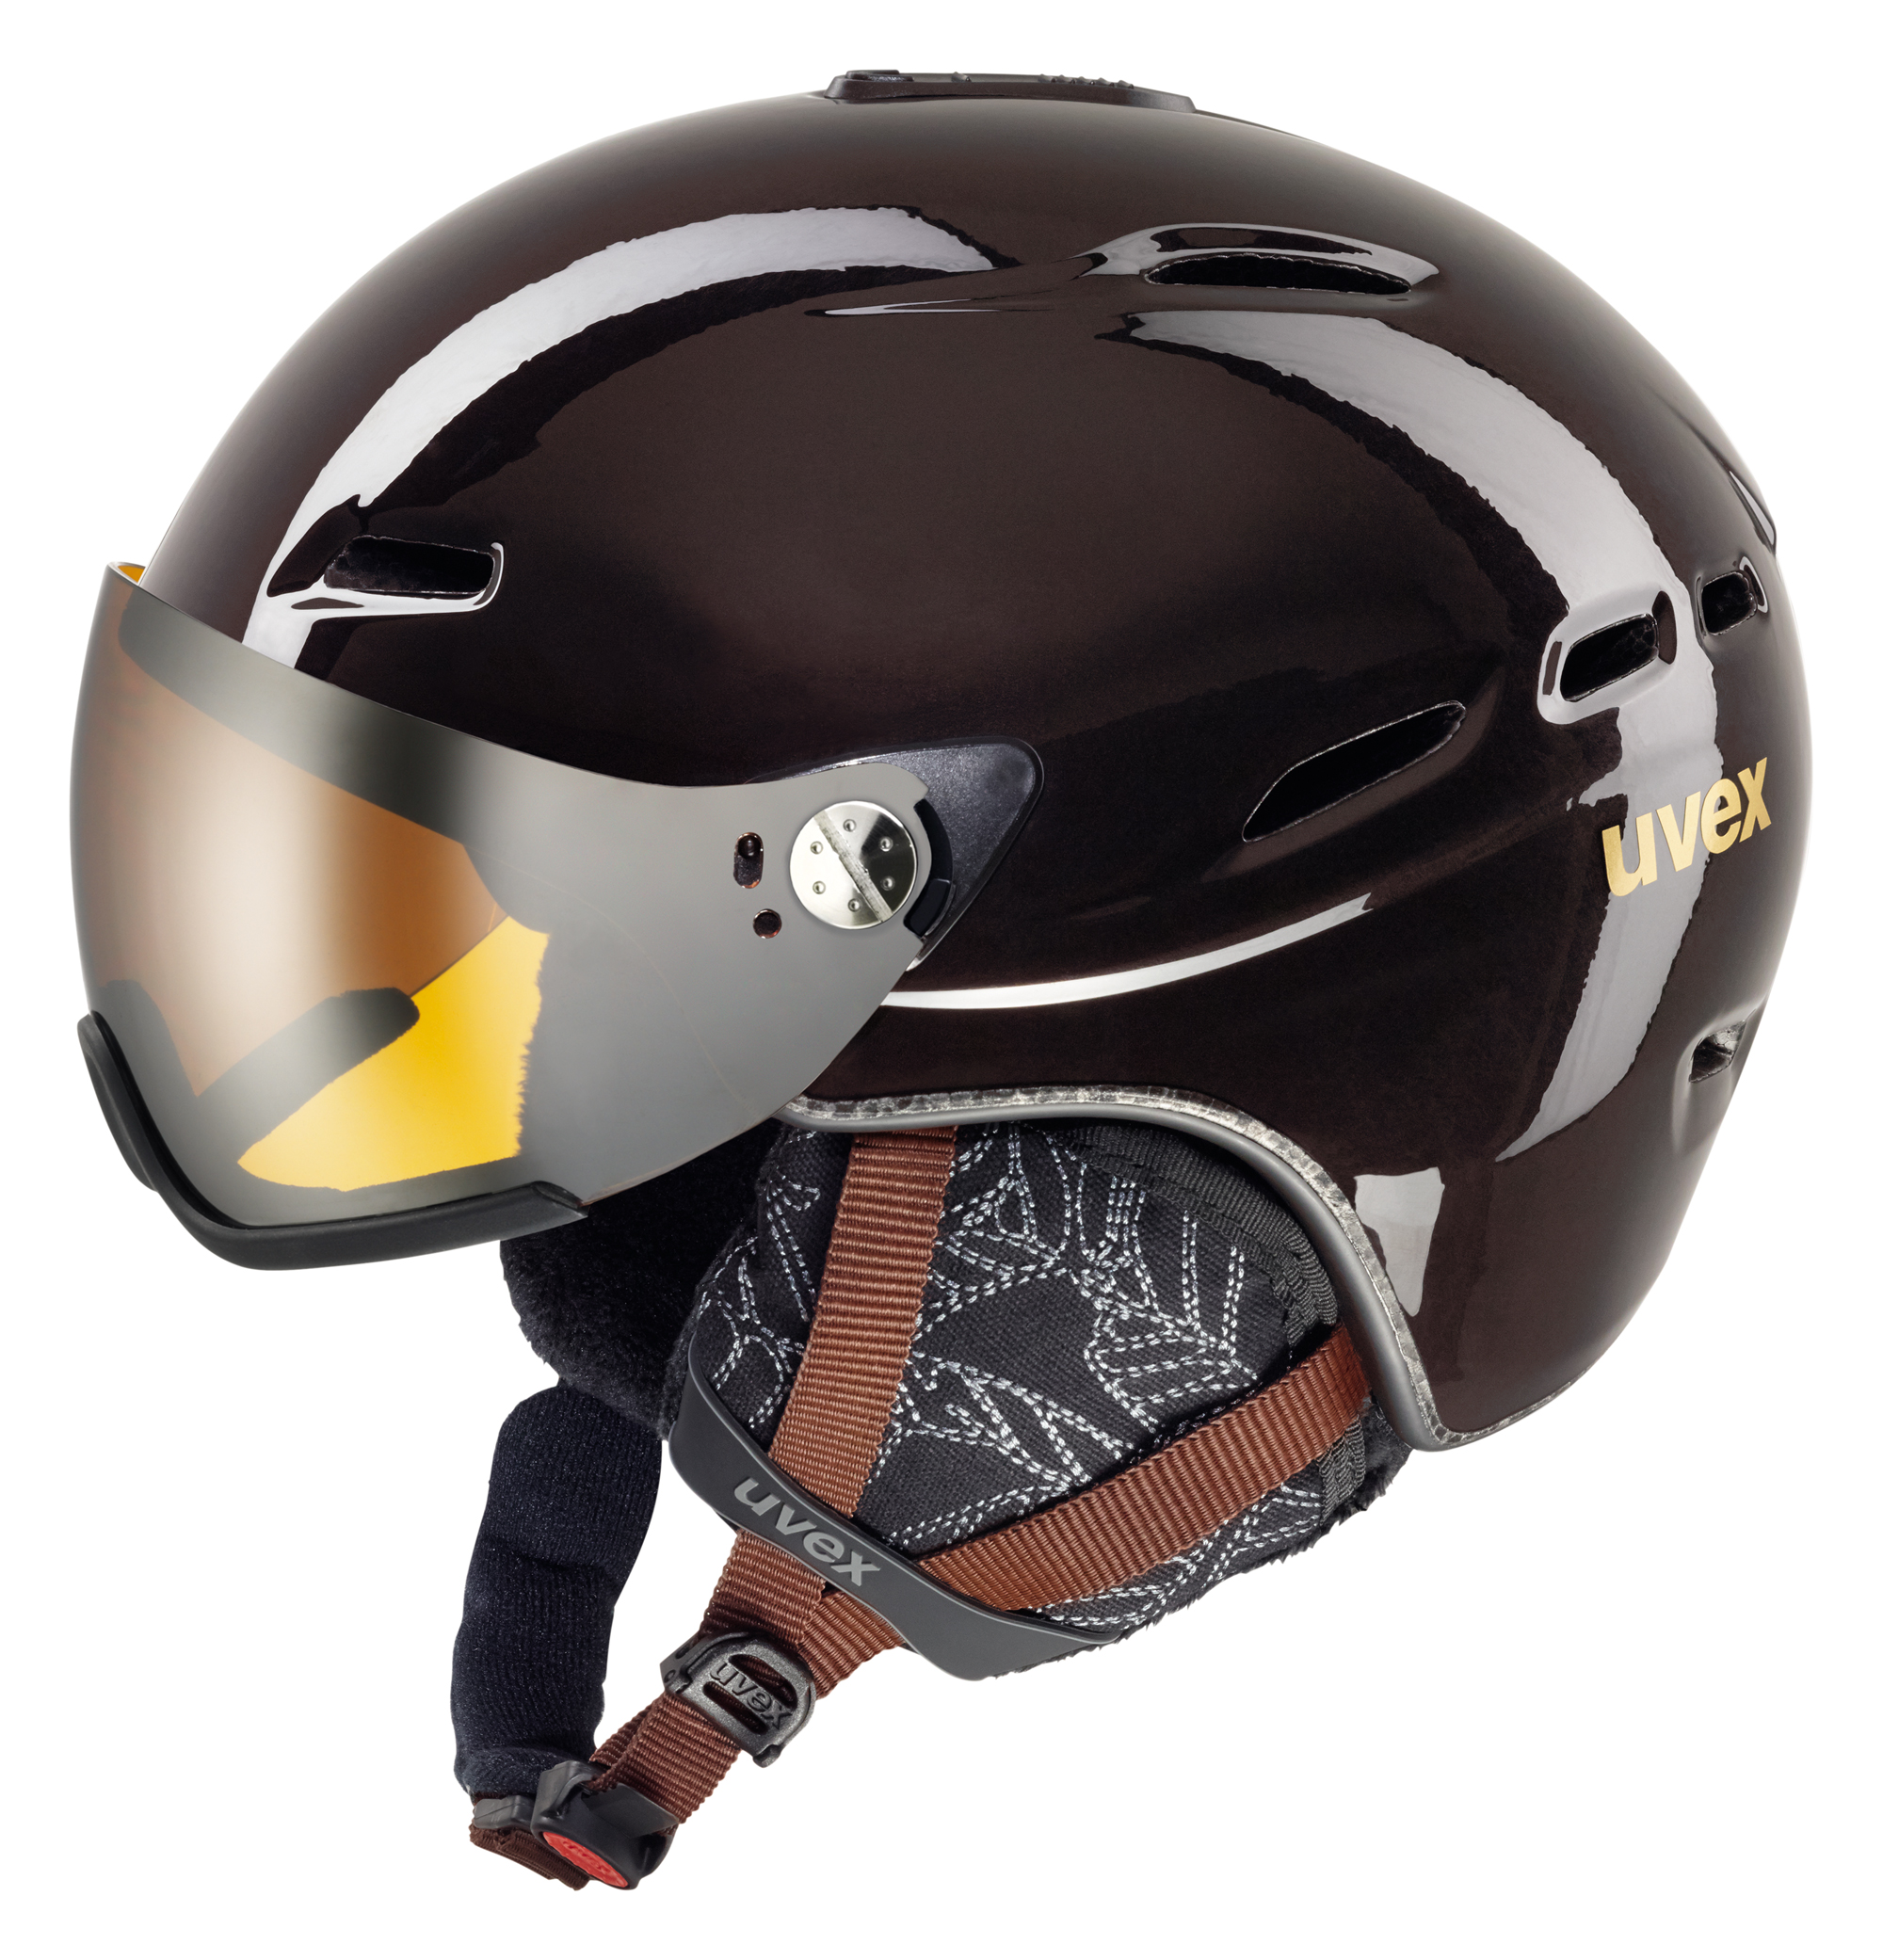 UVEX HLMT 200 WL, chocolate S566183800 55-58 cm